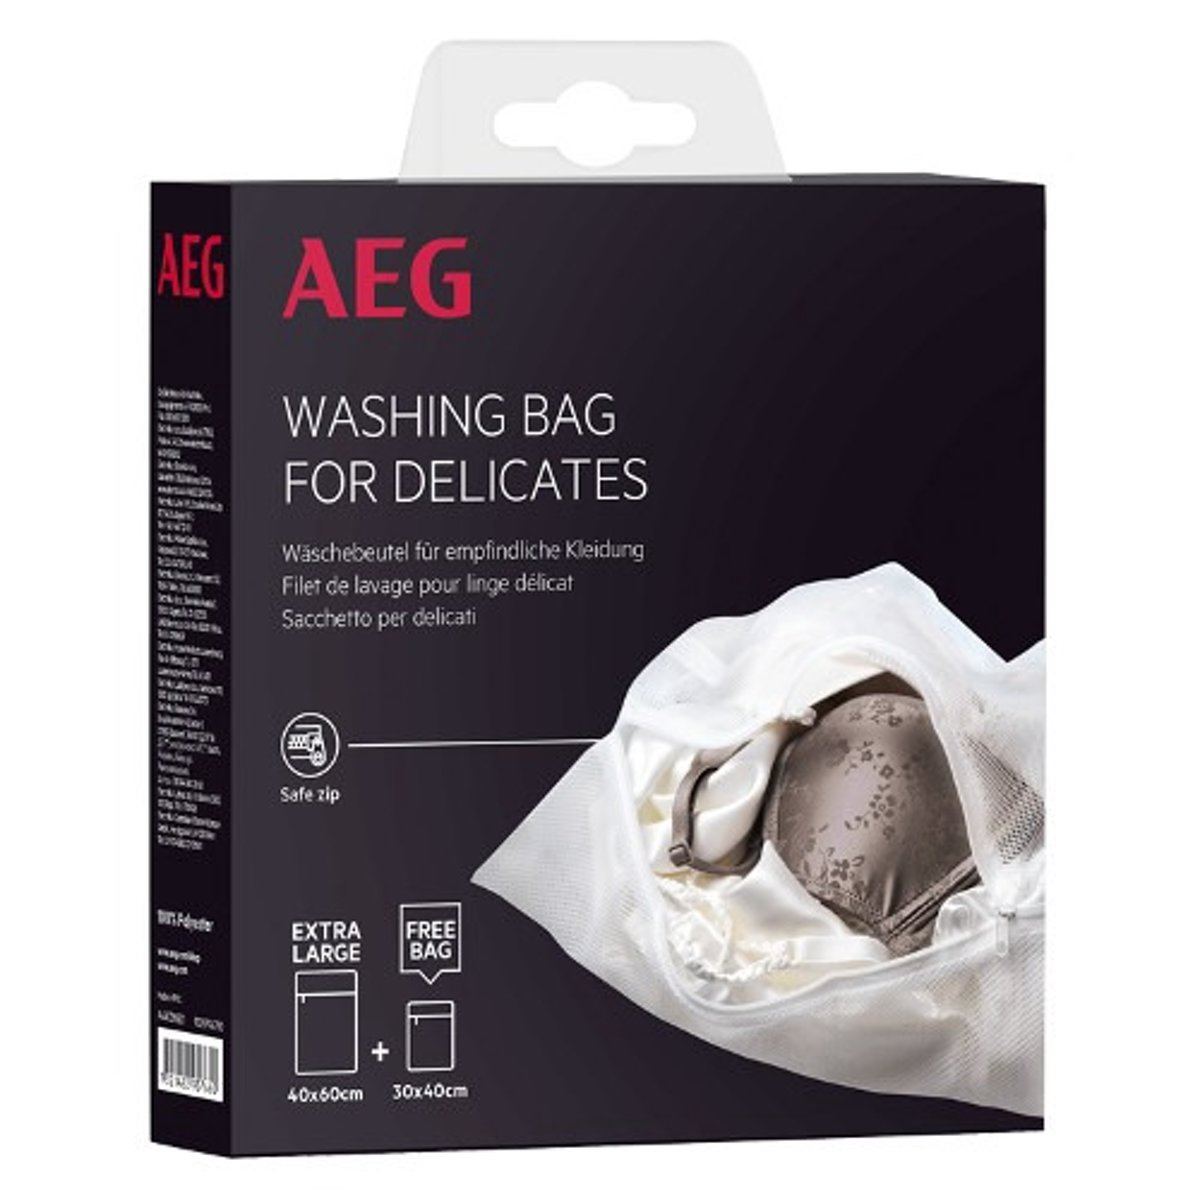 AEG A4WZWB31 Wasnet kopen